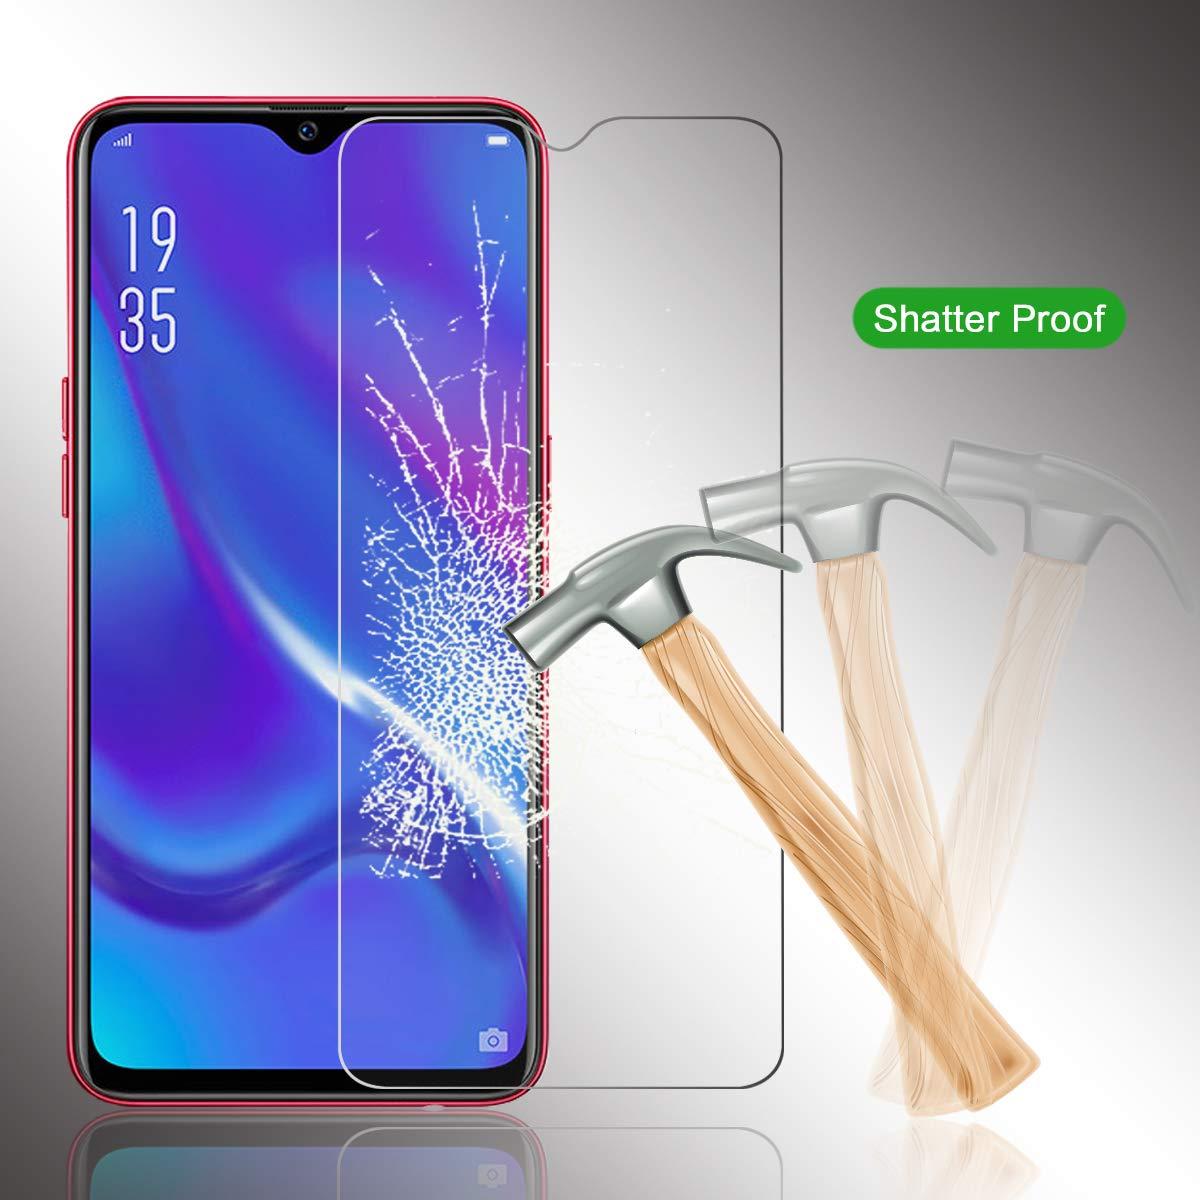 As Shown Casefirst Oppo RX17 Neo Film Tremp/é Protection 3D Touch Verre tremp/é Anti Rayures Anti-D/érapant Haute duret/é R/ésistant aux Rayures Ultra Duret/é Glass Screen Protector